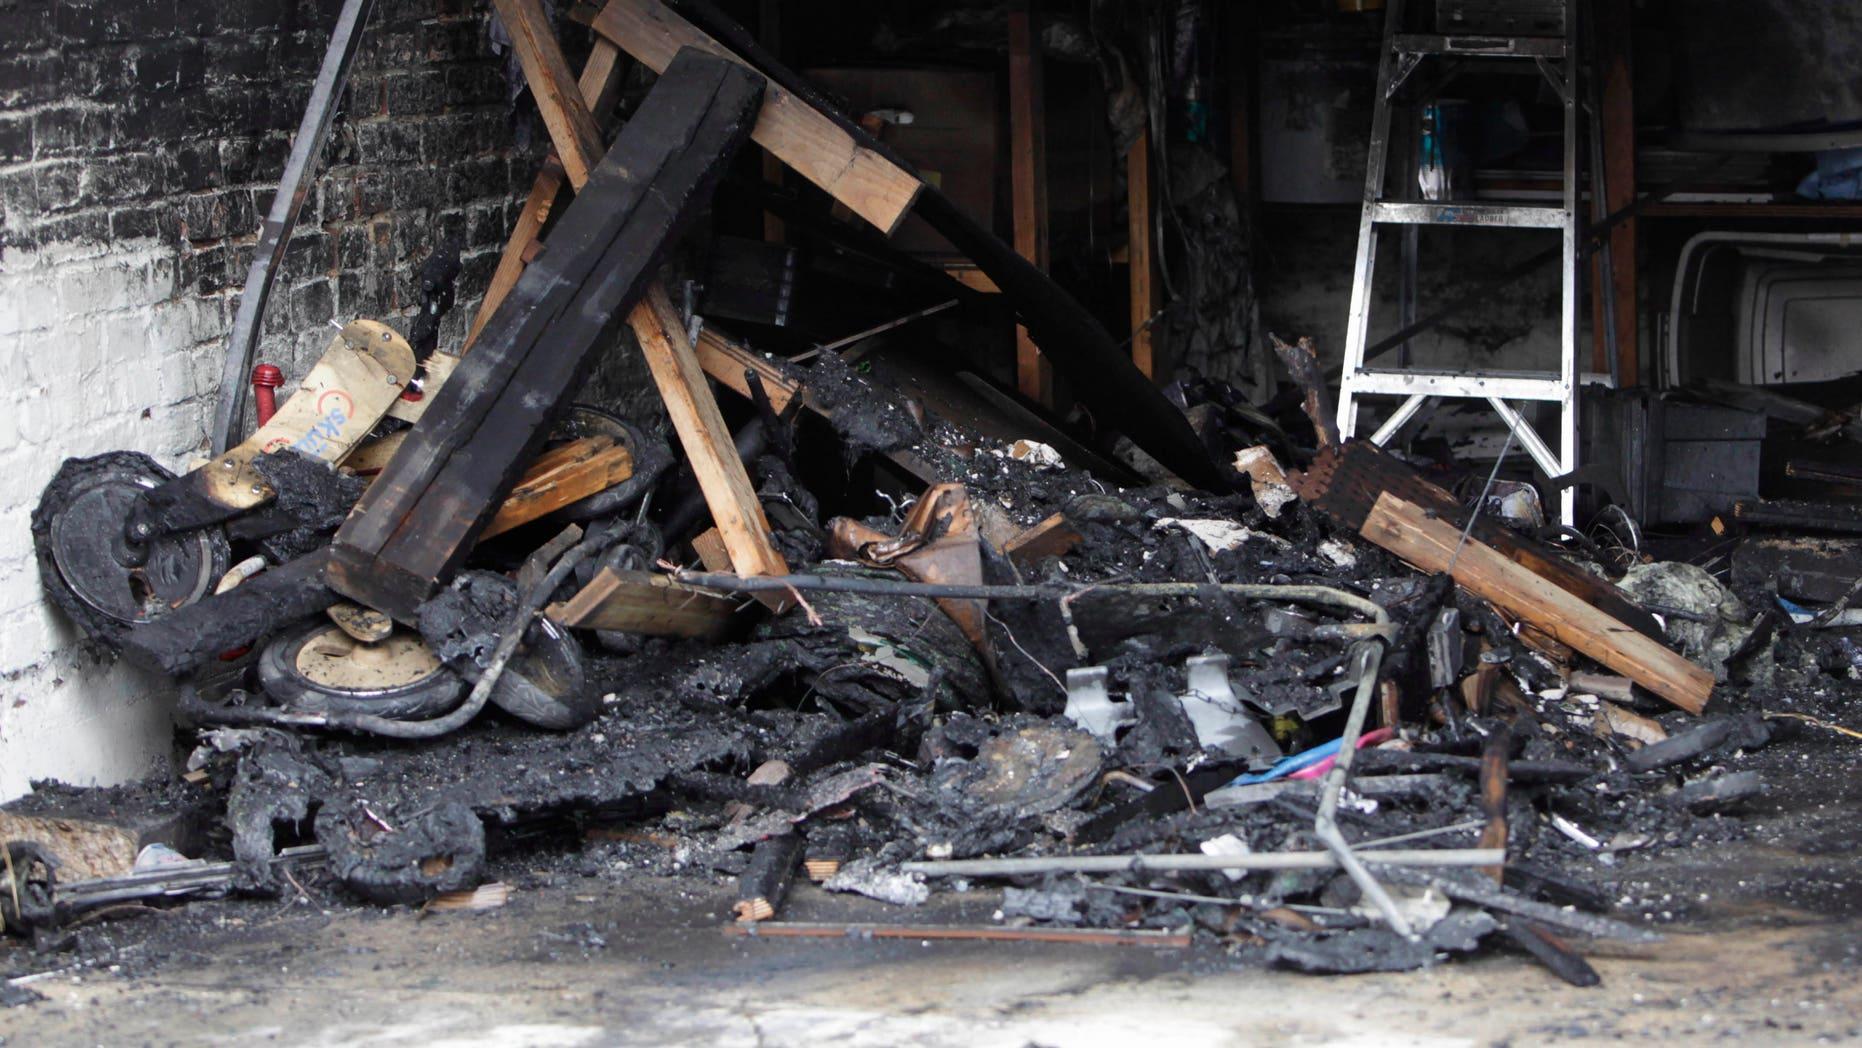 Jan. 10: Burnt debris fills garage in Southeast Washington, where a Washington lobbyist was found dead. Lobbyist Ashley Turton, the wife of a White House adviser Dan Turton, was found dead inside a burning car in the garage.